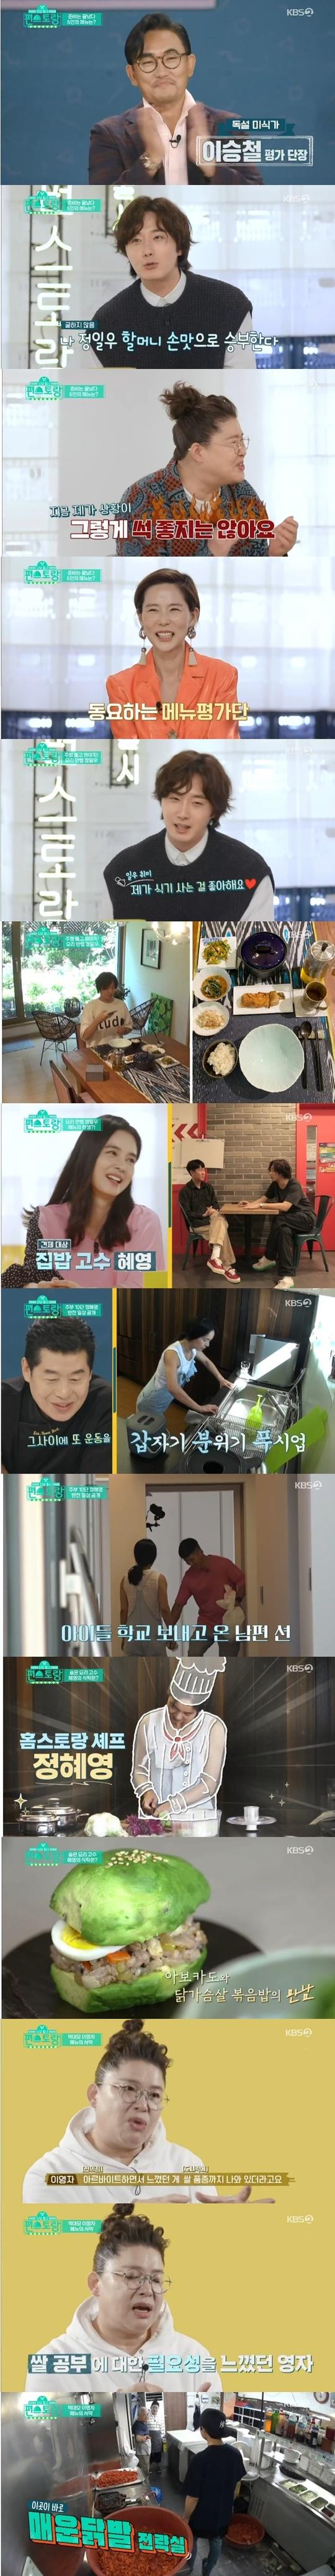 2019 10 25 Jung Il woo in Convenient Restaurant Episode 1. Media Photos. 2